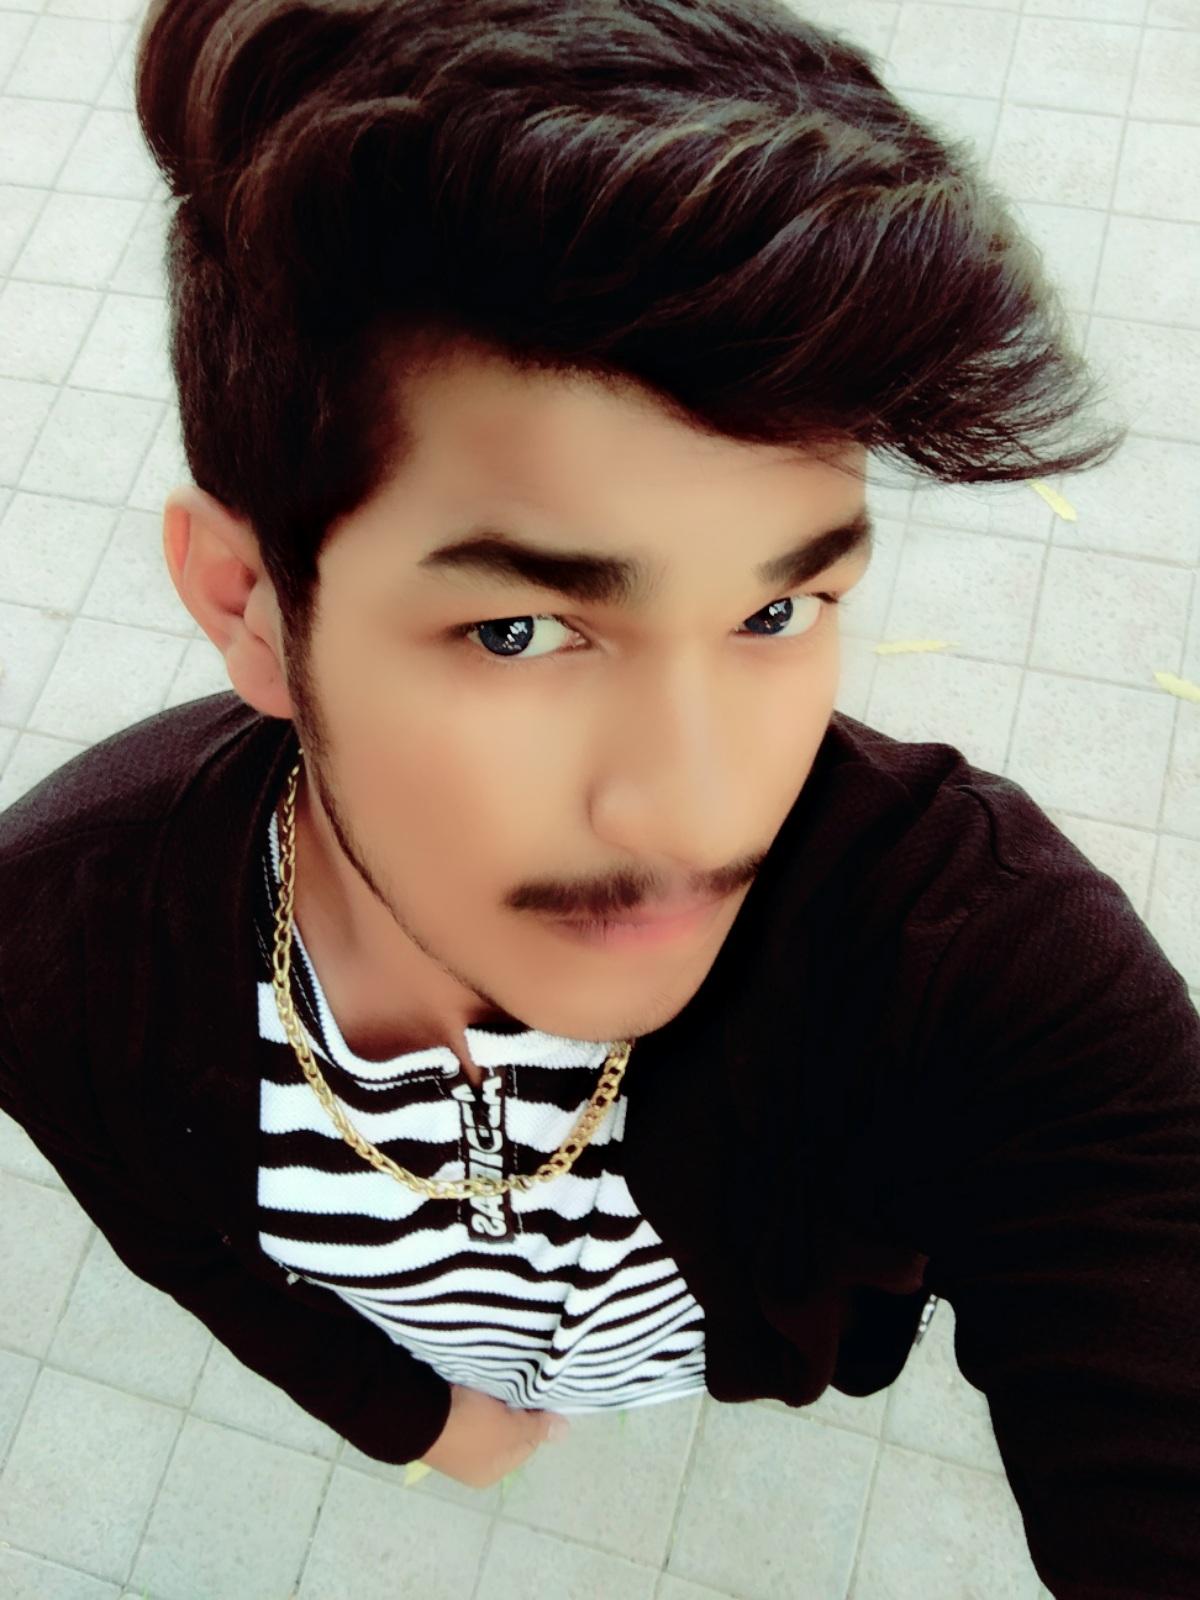 Indian model boy photo